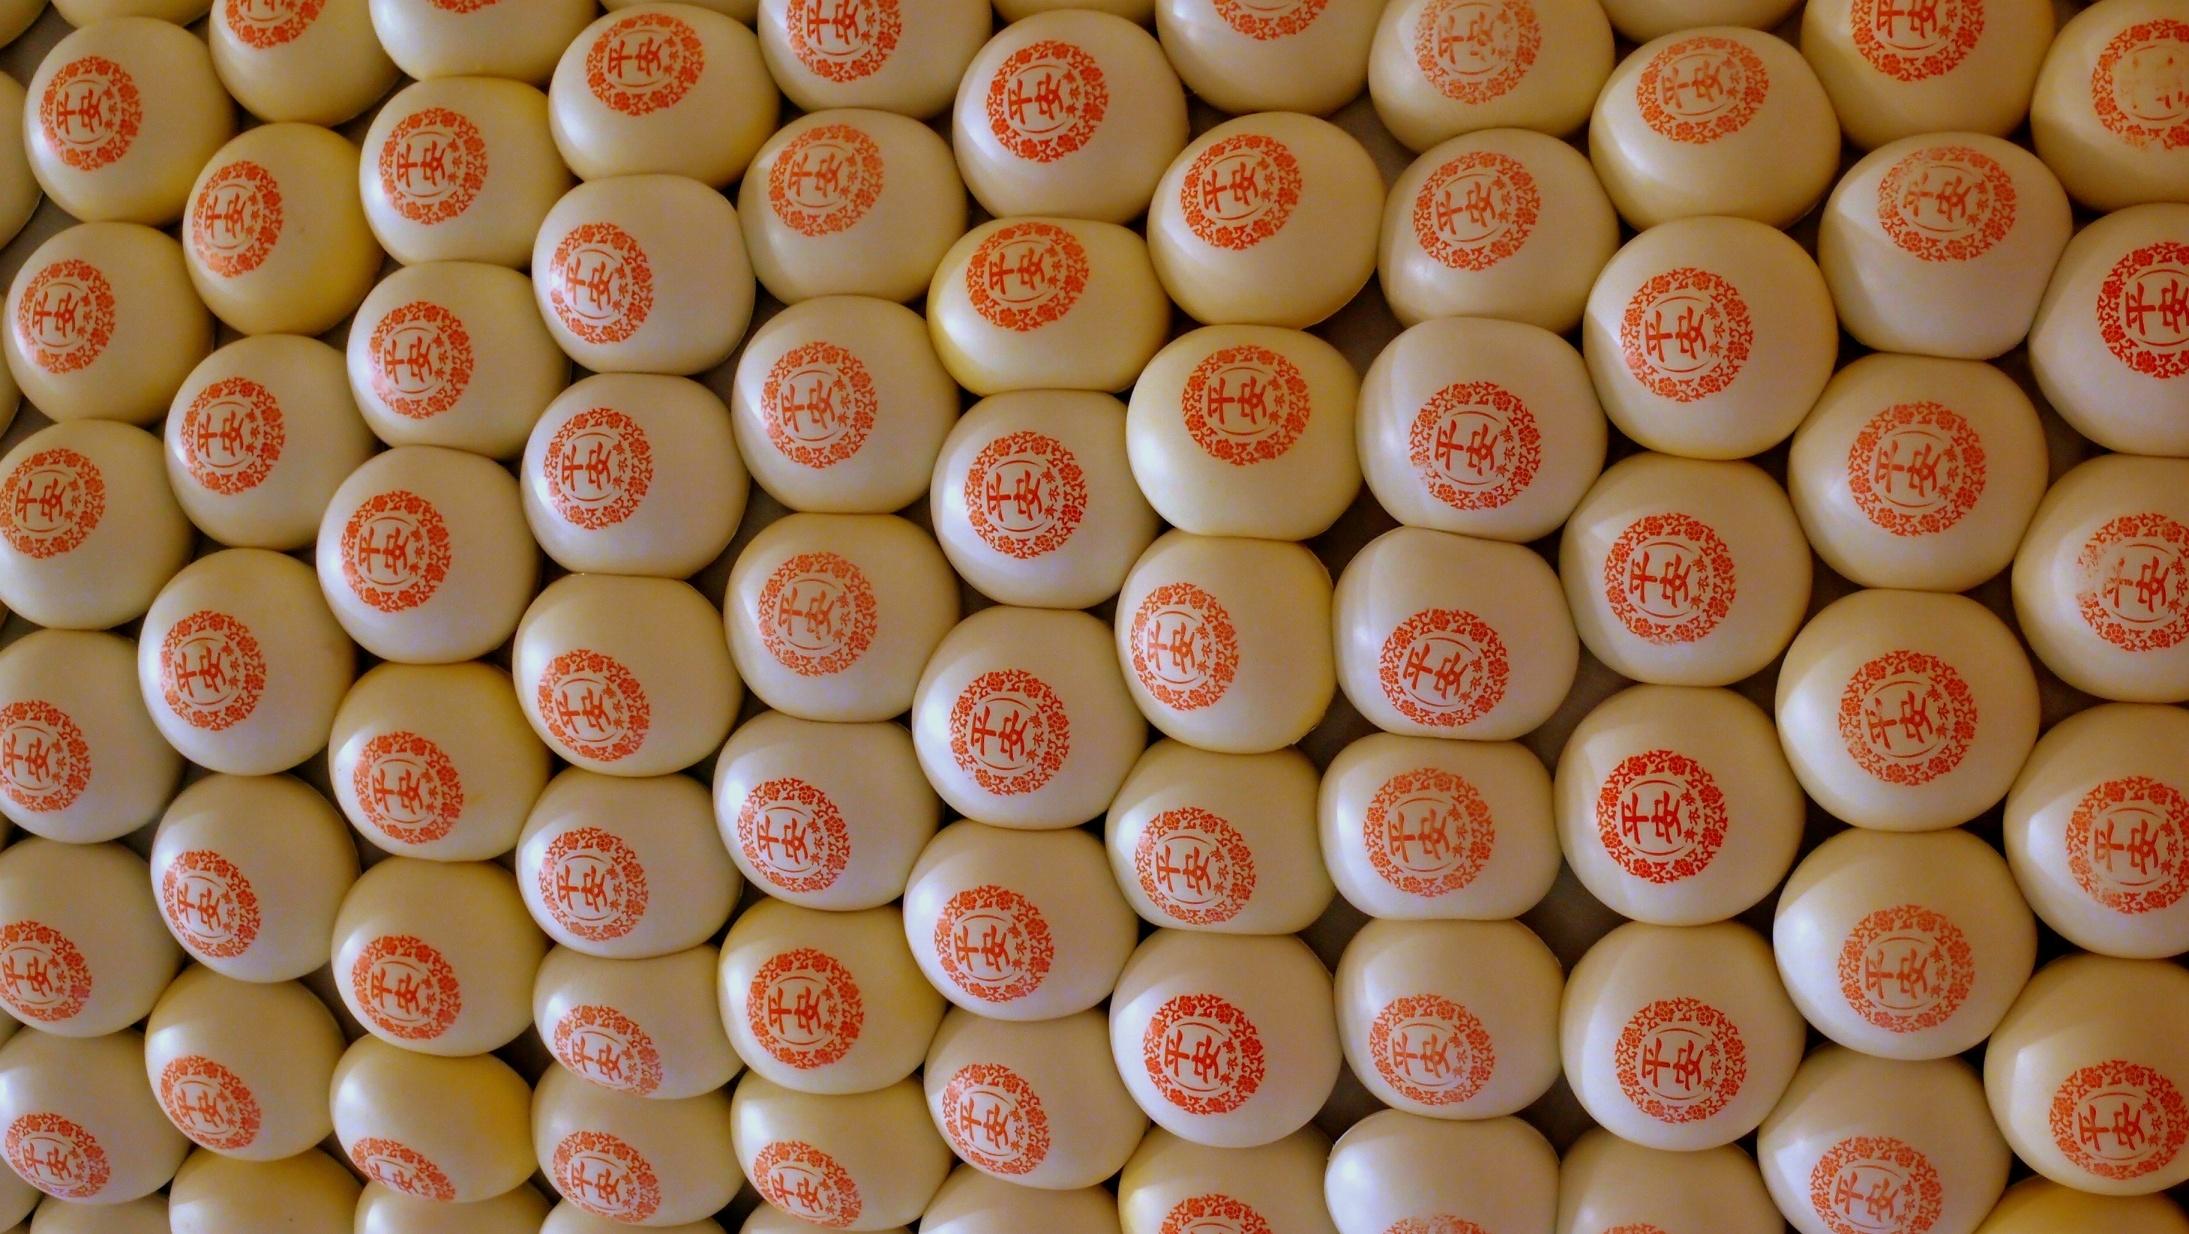 May 17th - the legendary Cheung Chau bun festival